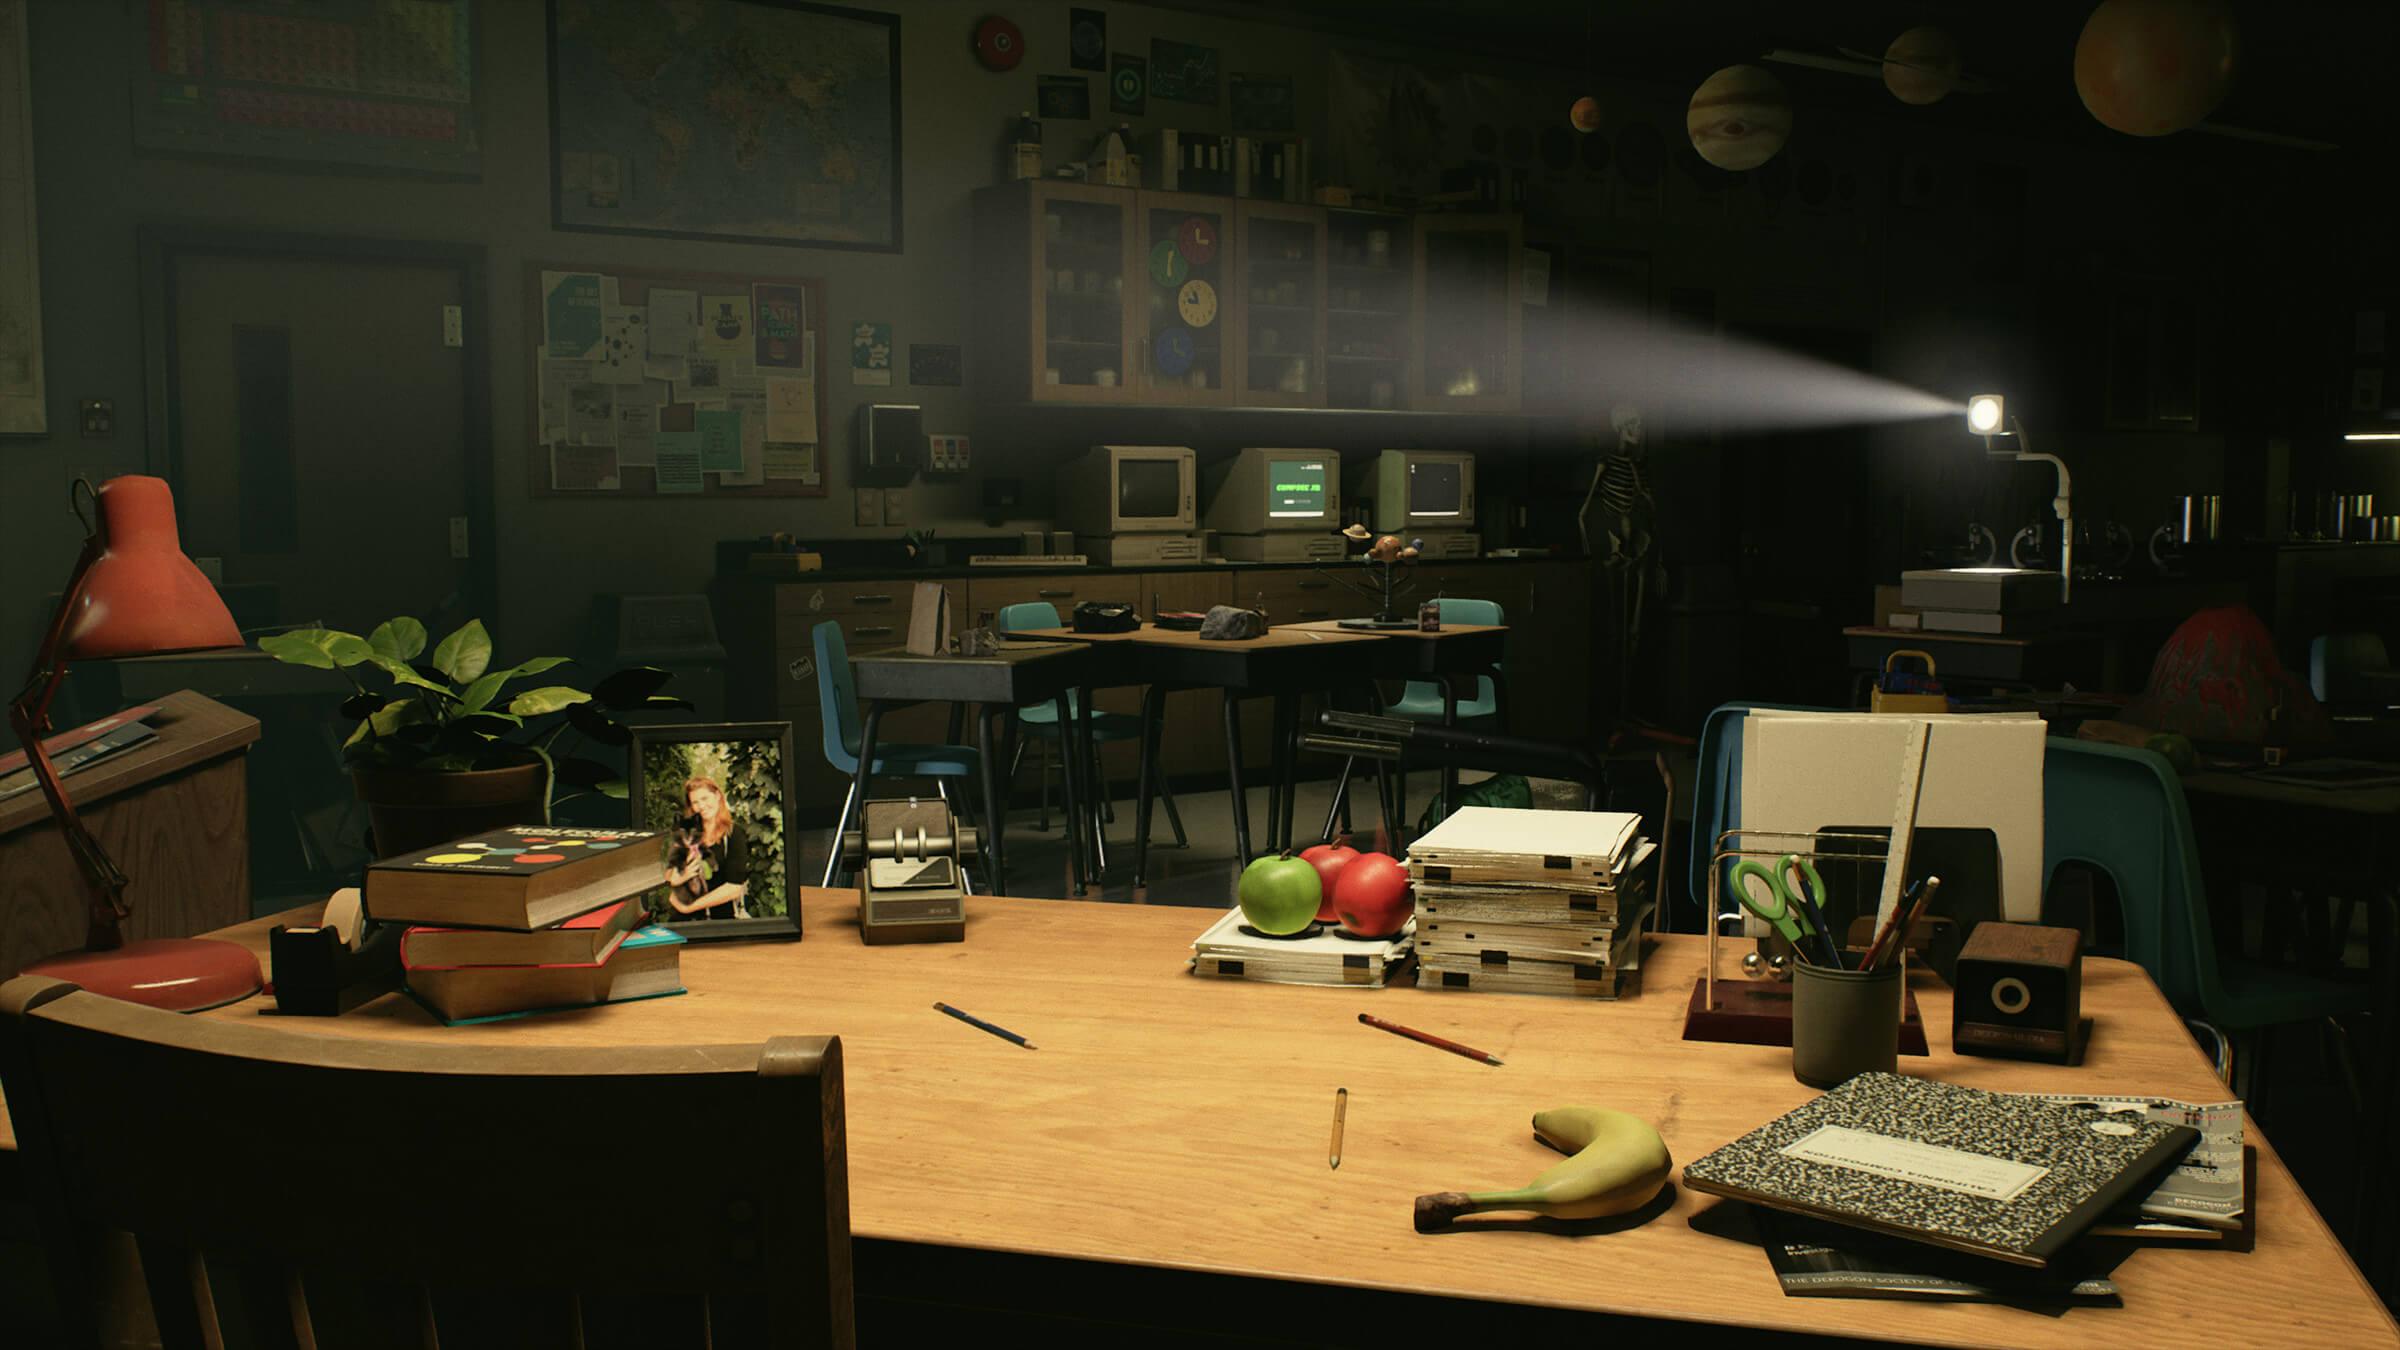 dekogon studios highresscreenshot00001 1 - 【画像】『PS5』世代のゲームはこんな感じのグラフィックになるらしい